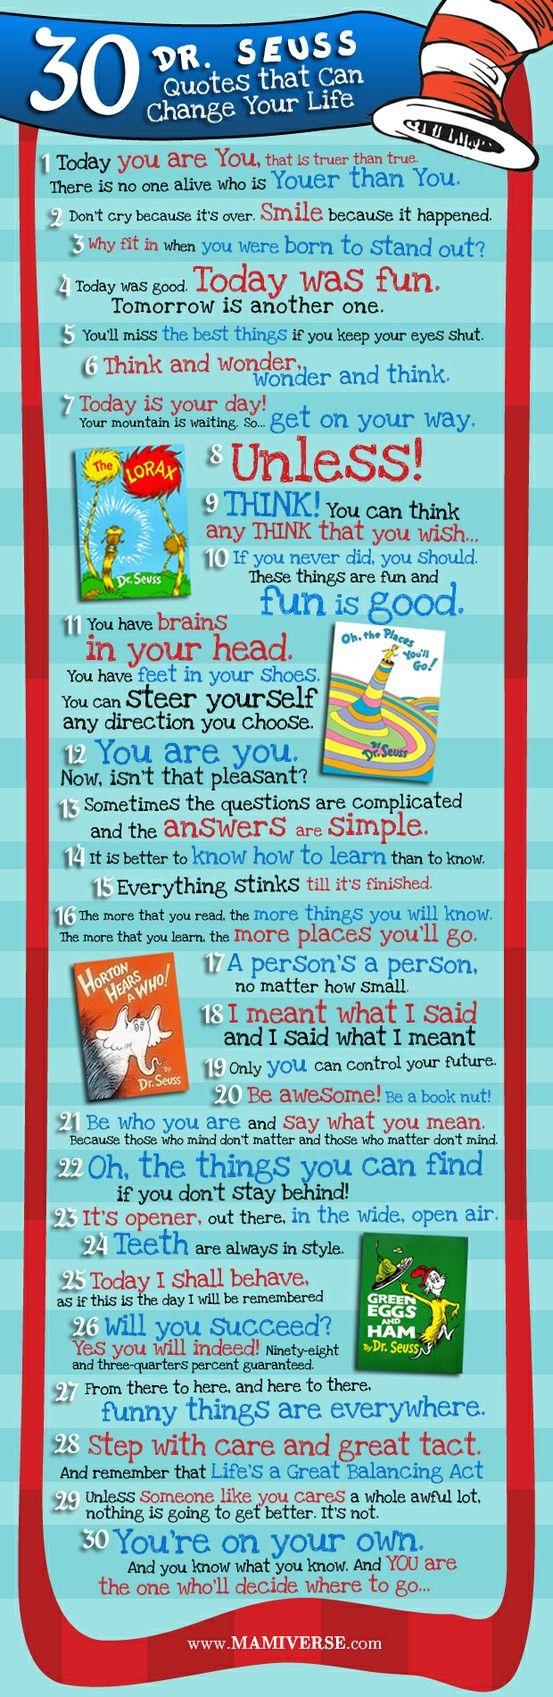 145 best Educational images on Pinterest | Leadership development ...